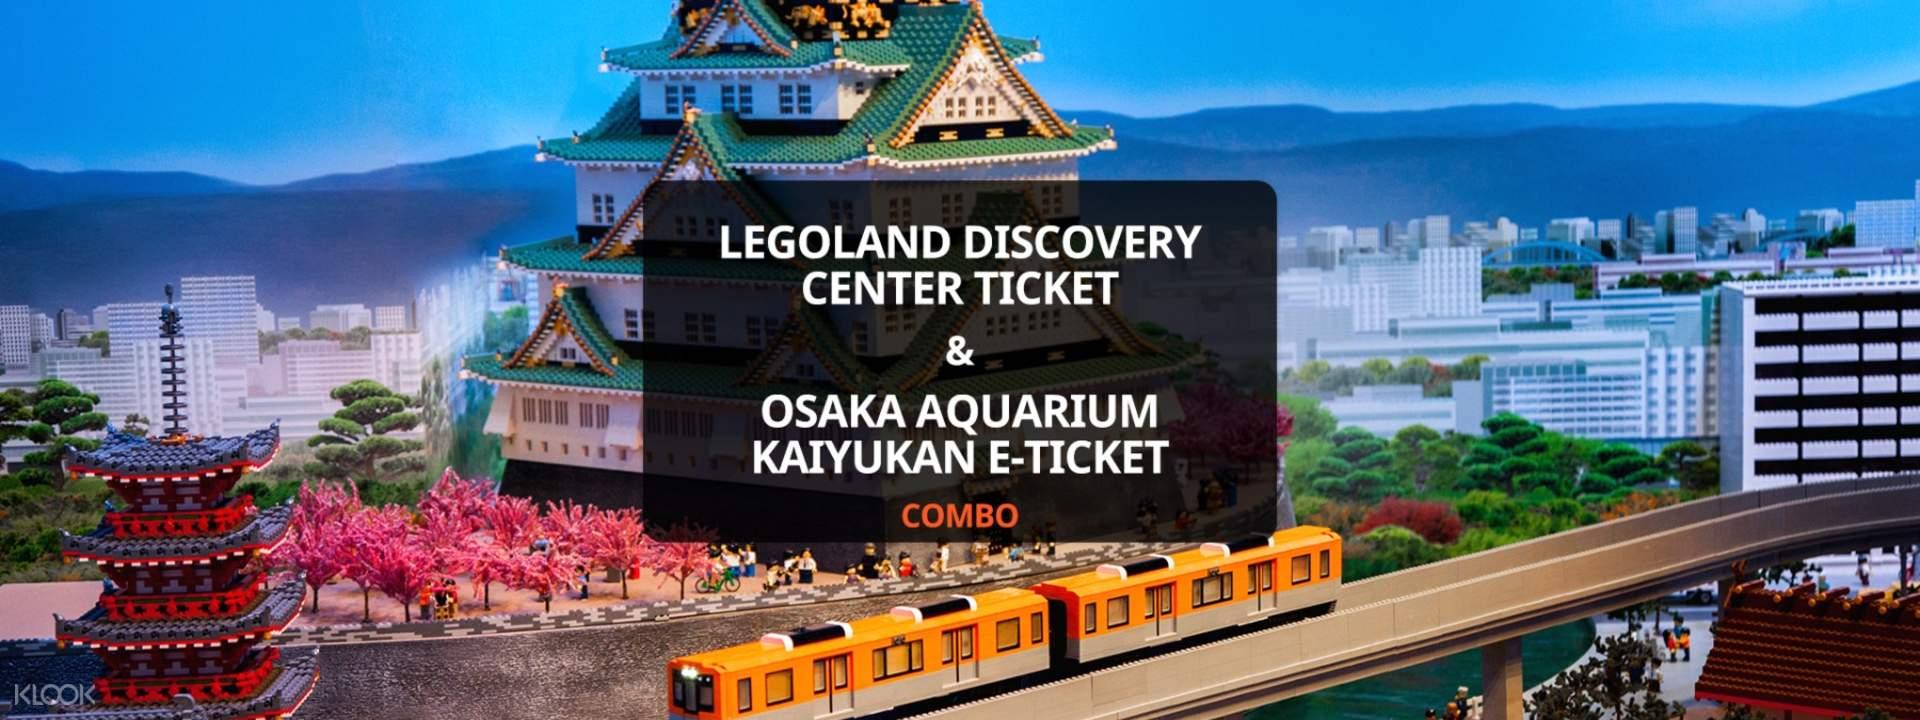 LEGOLAND Discovery Center & Osaka Aquarium Kaiyukan Ticket ...